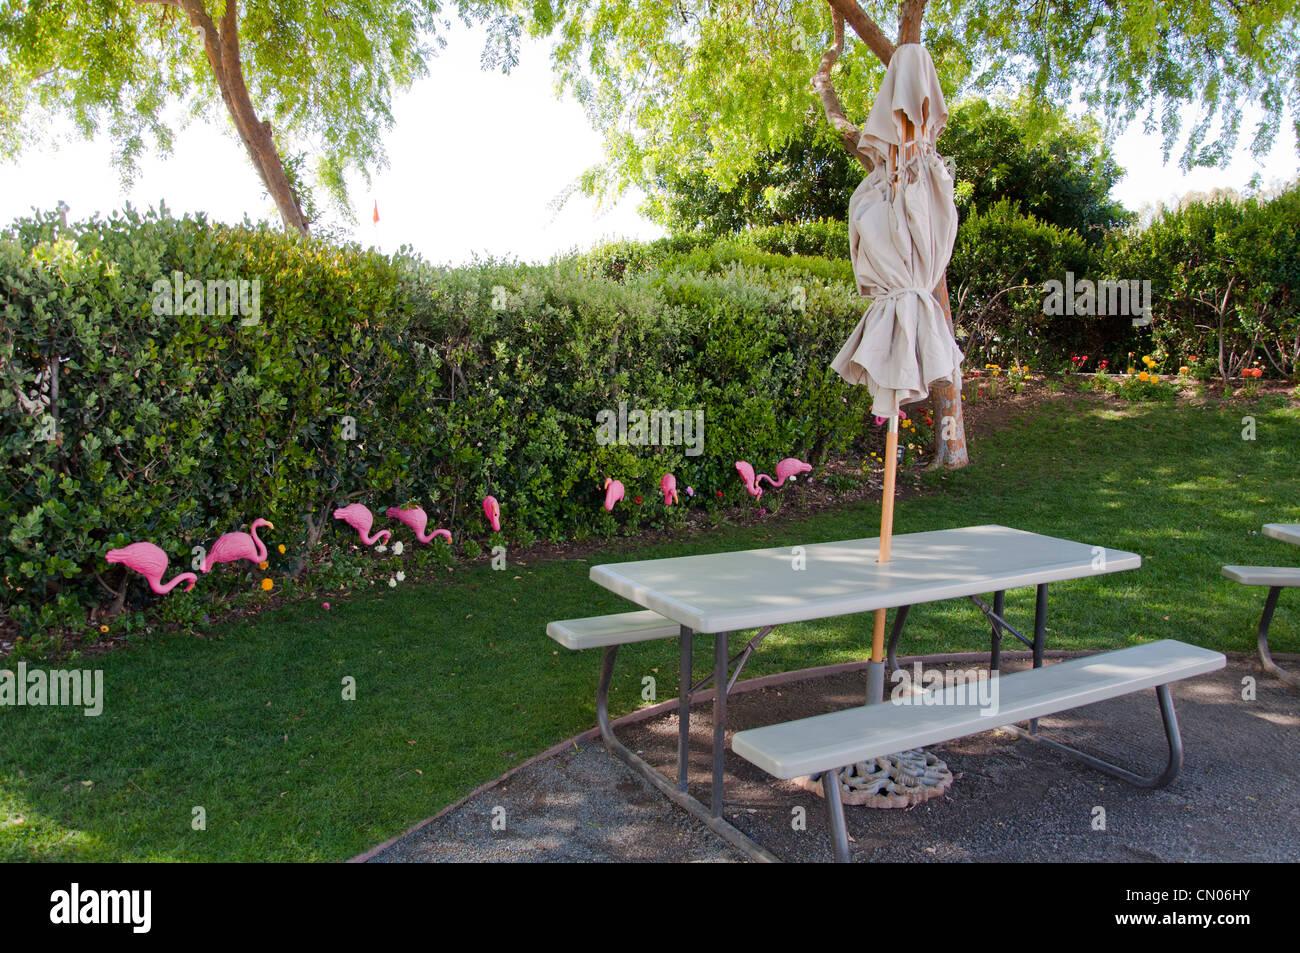 Backyard with table and umbrella - Stock Image